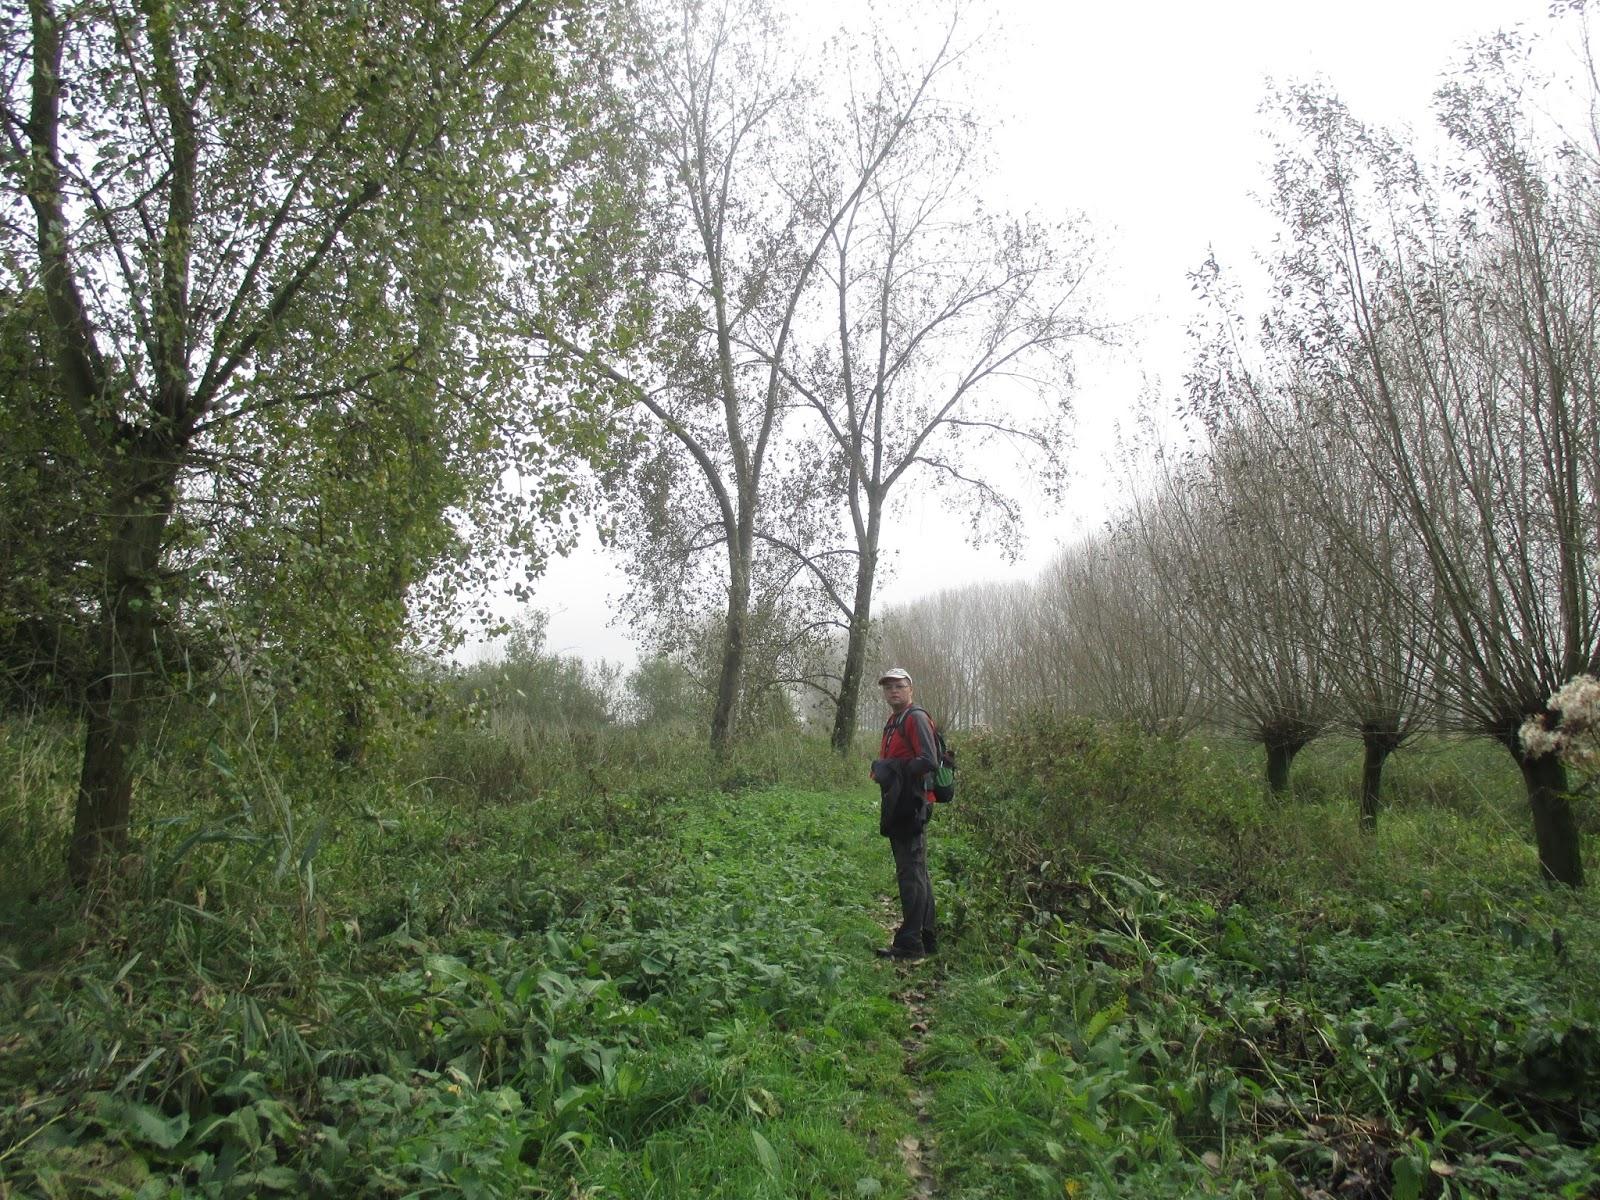 Landgoed Groot Eiland (Hulst)